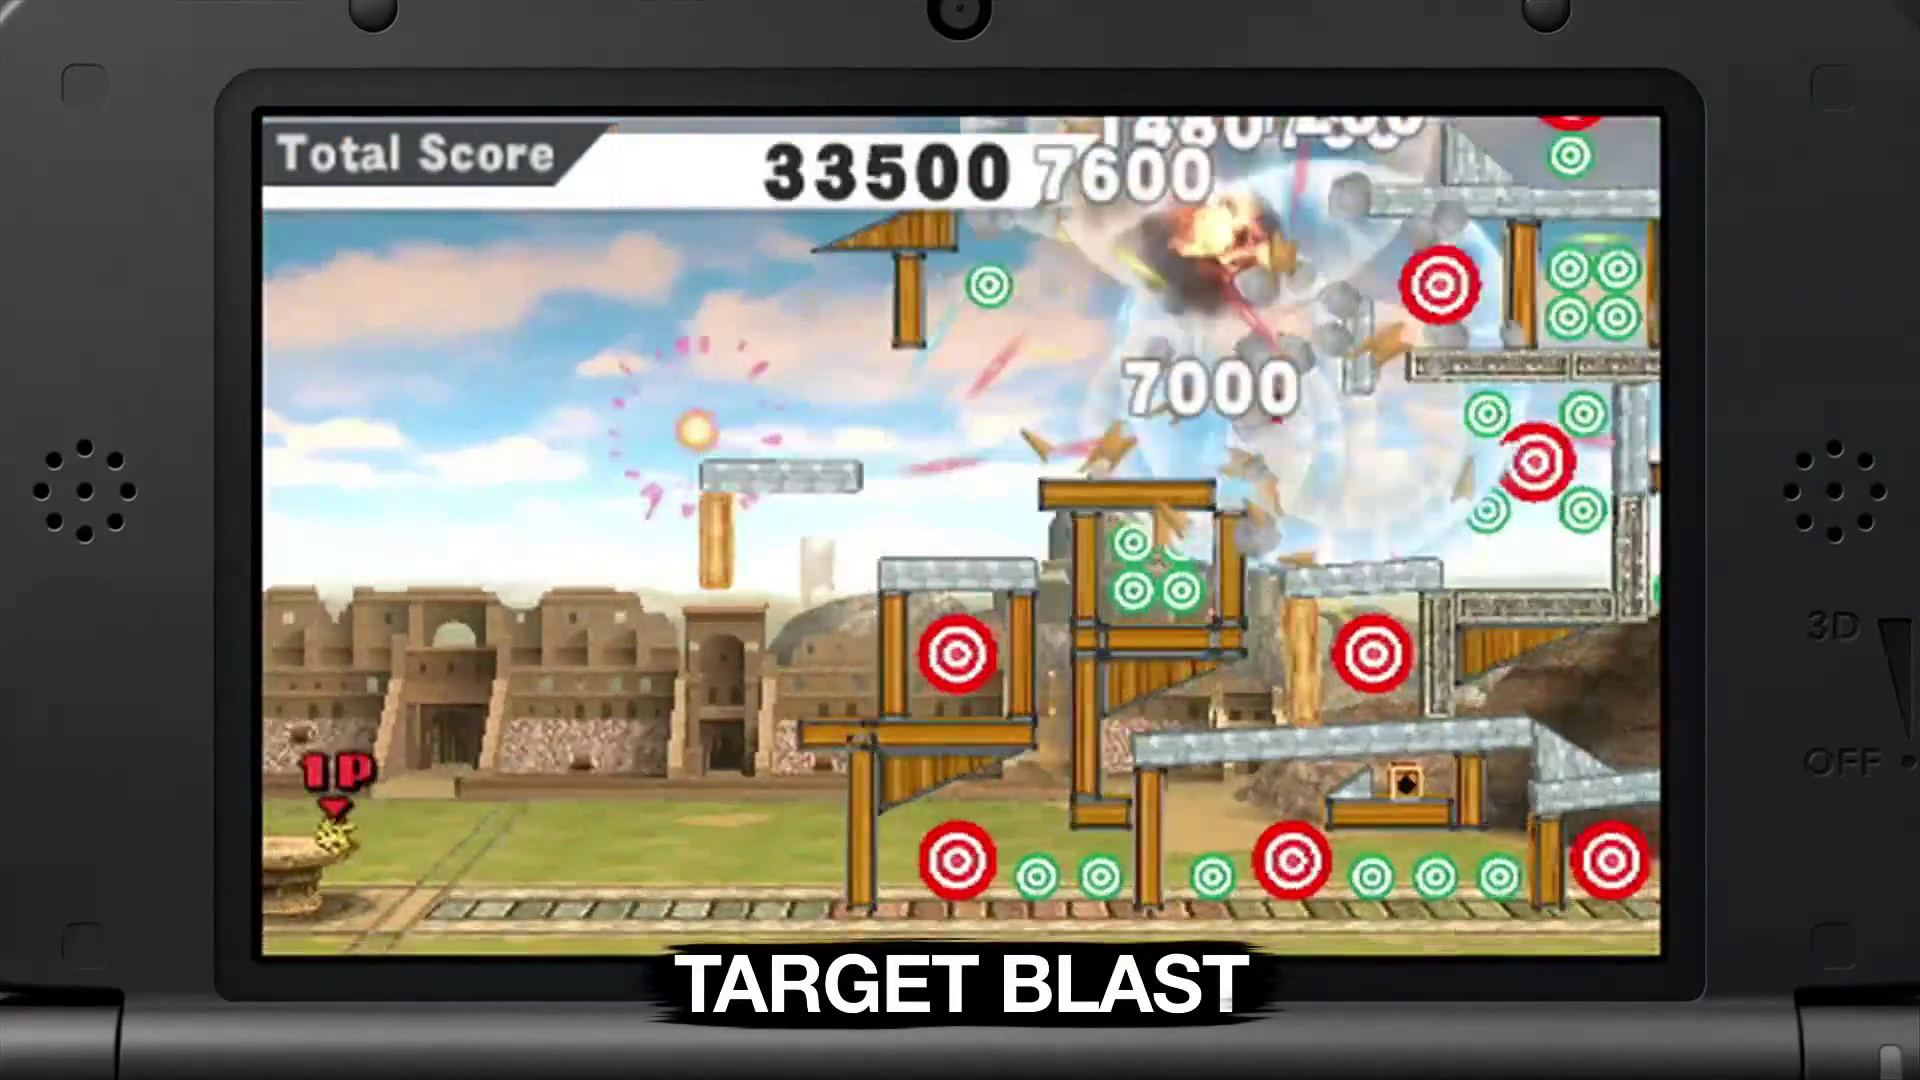 Super Smash Bros - Nintendo 3DS - Target Blast Screen - Angry Birds